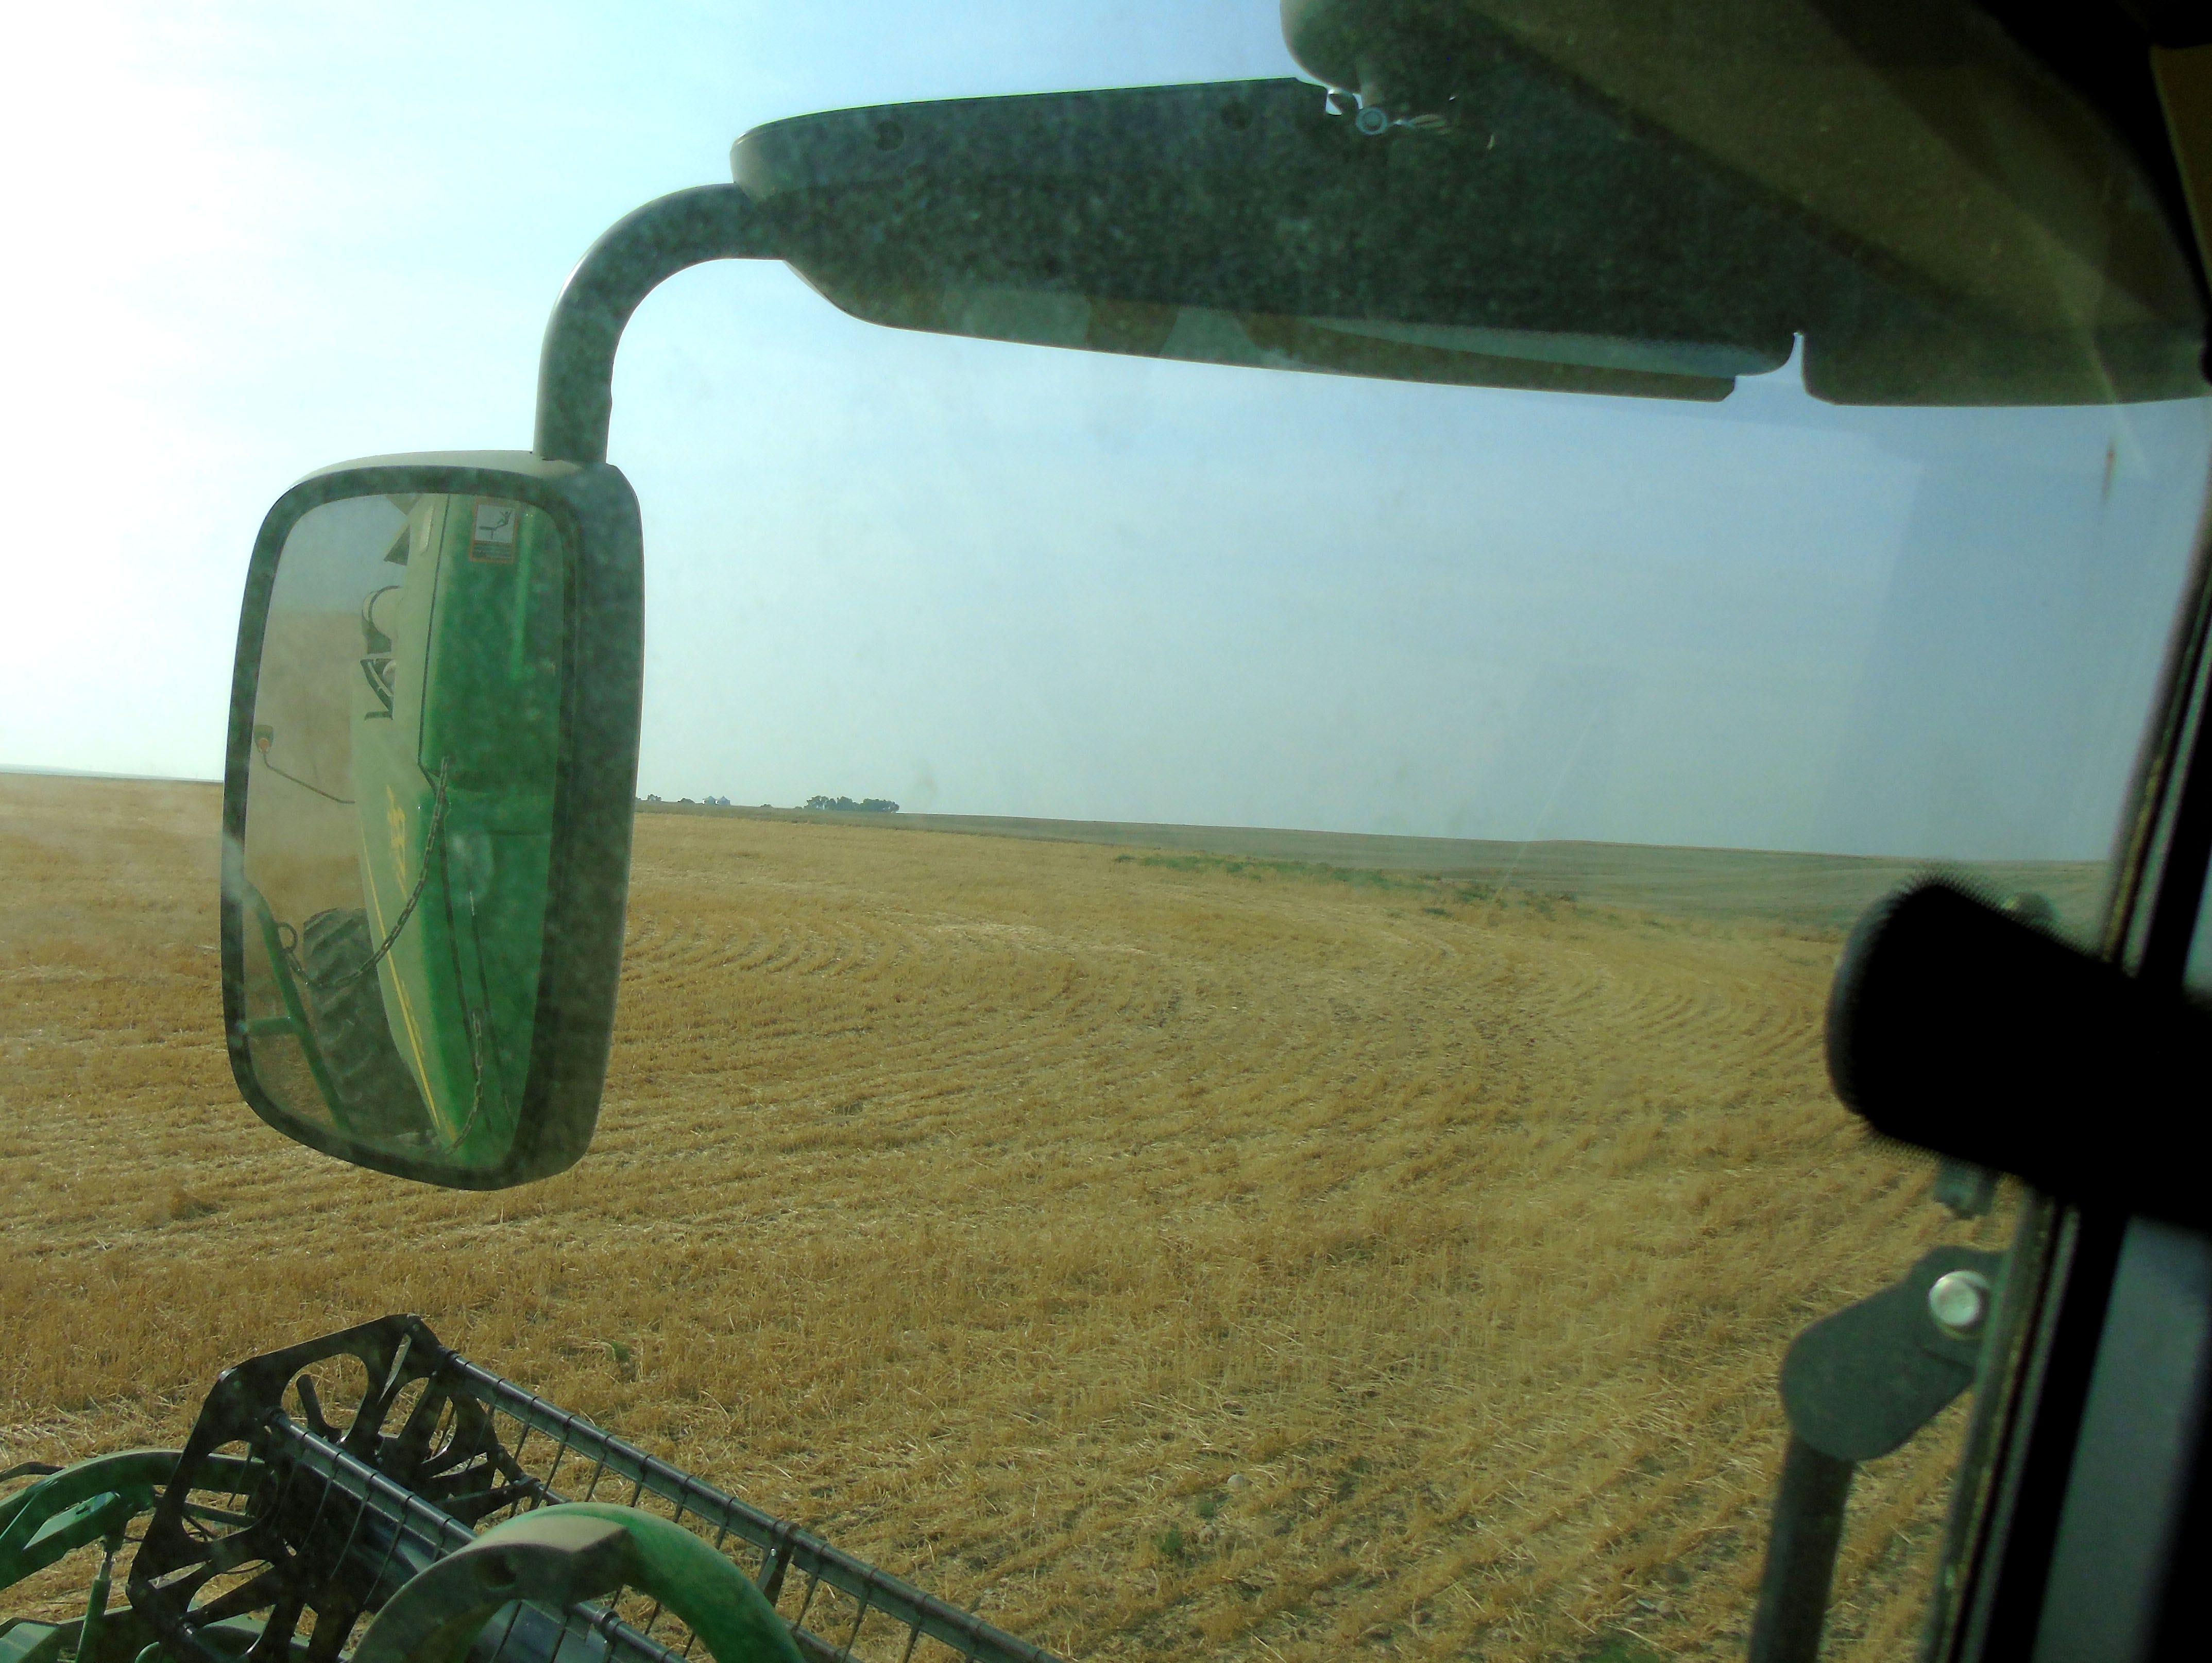 Kallan Bahnmiller harvests winter wheat near Big Sandy.